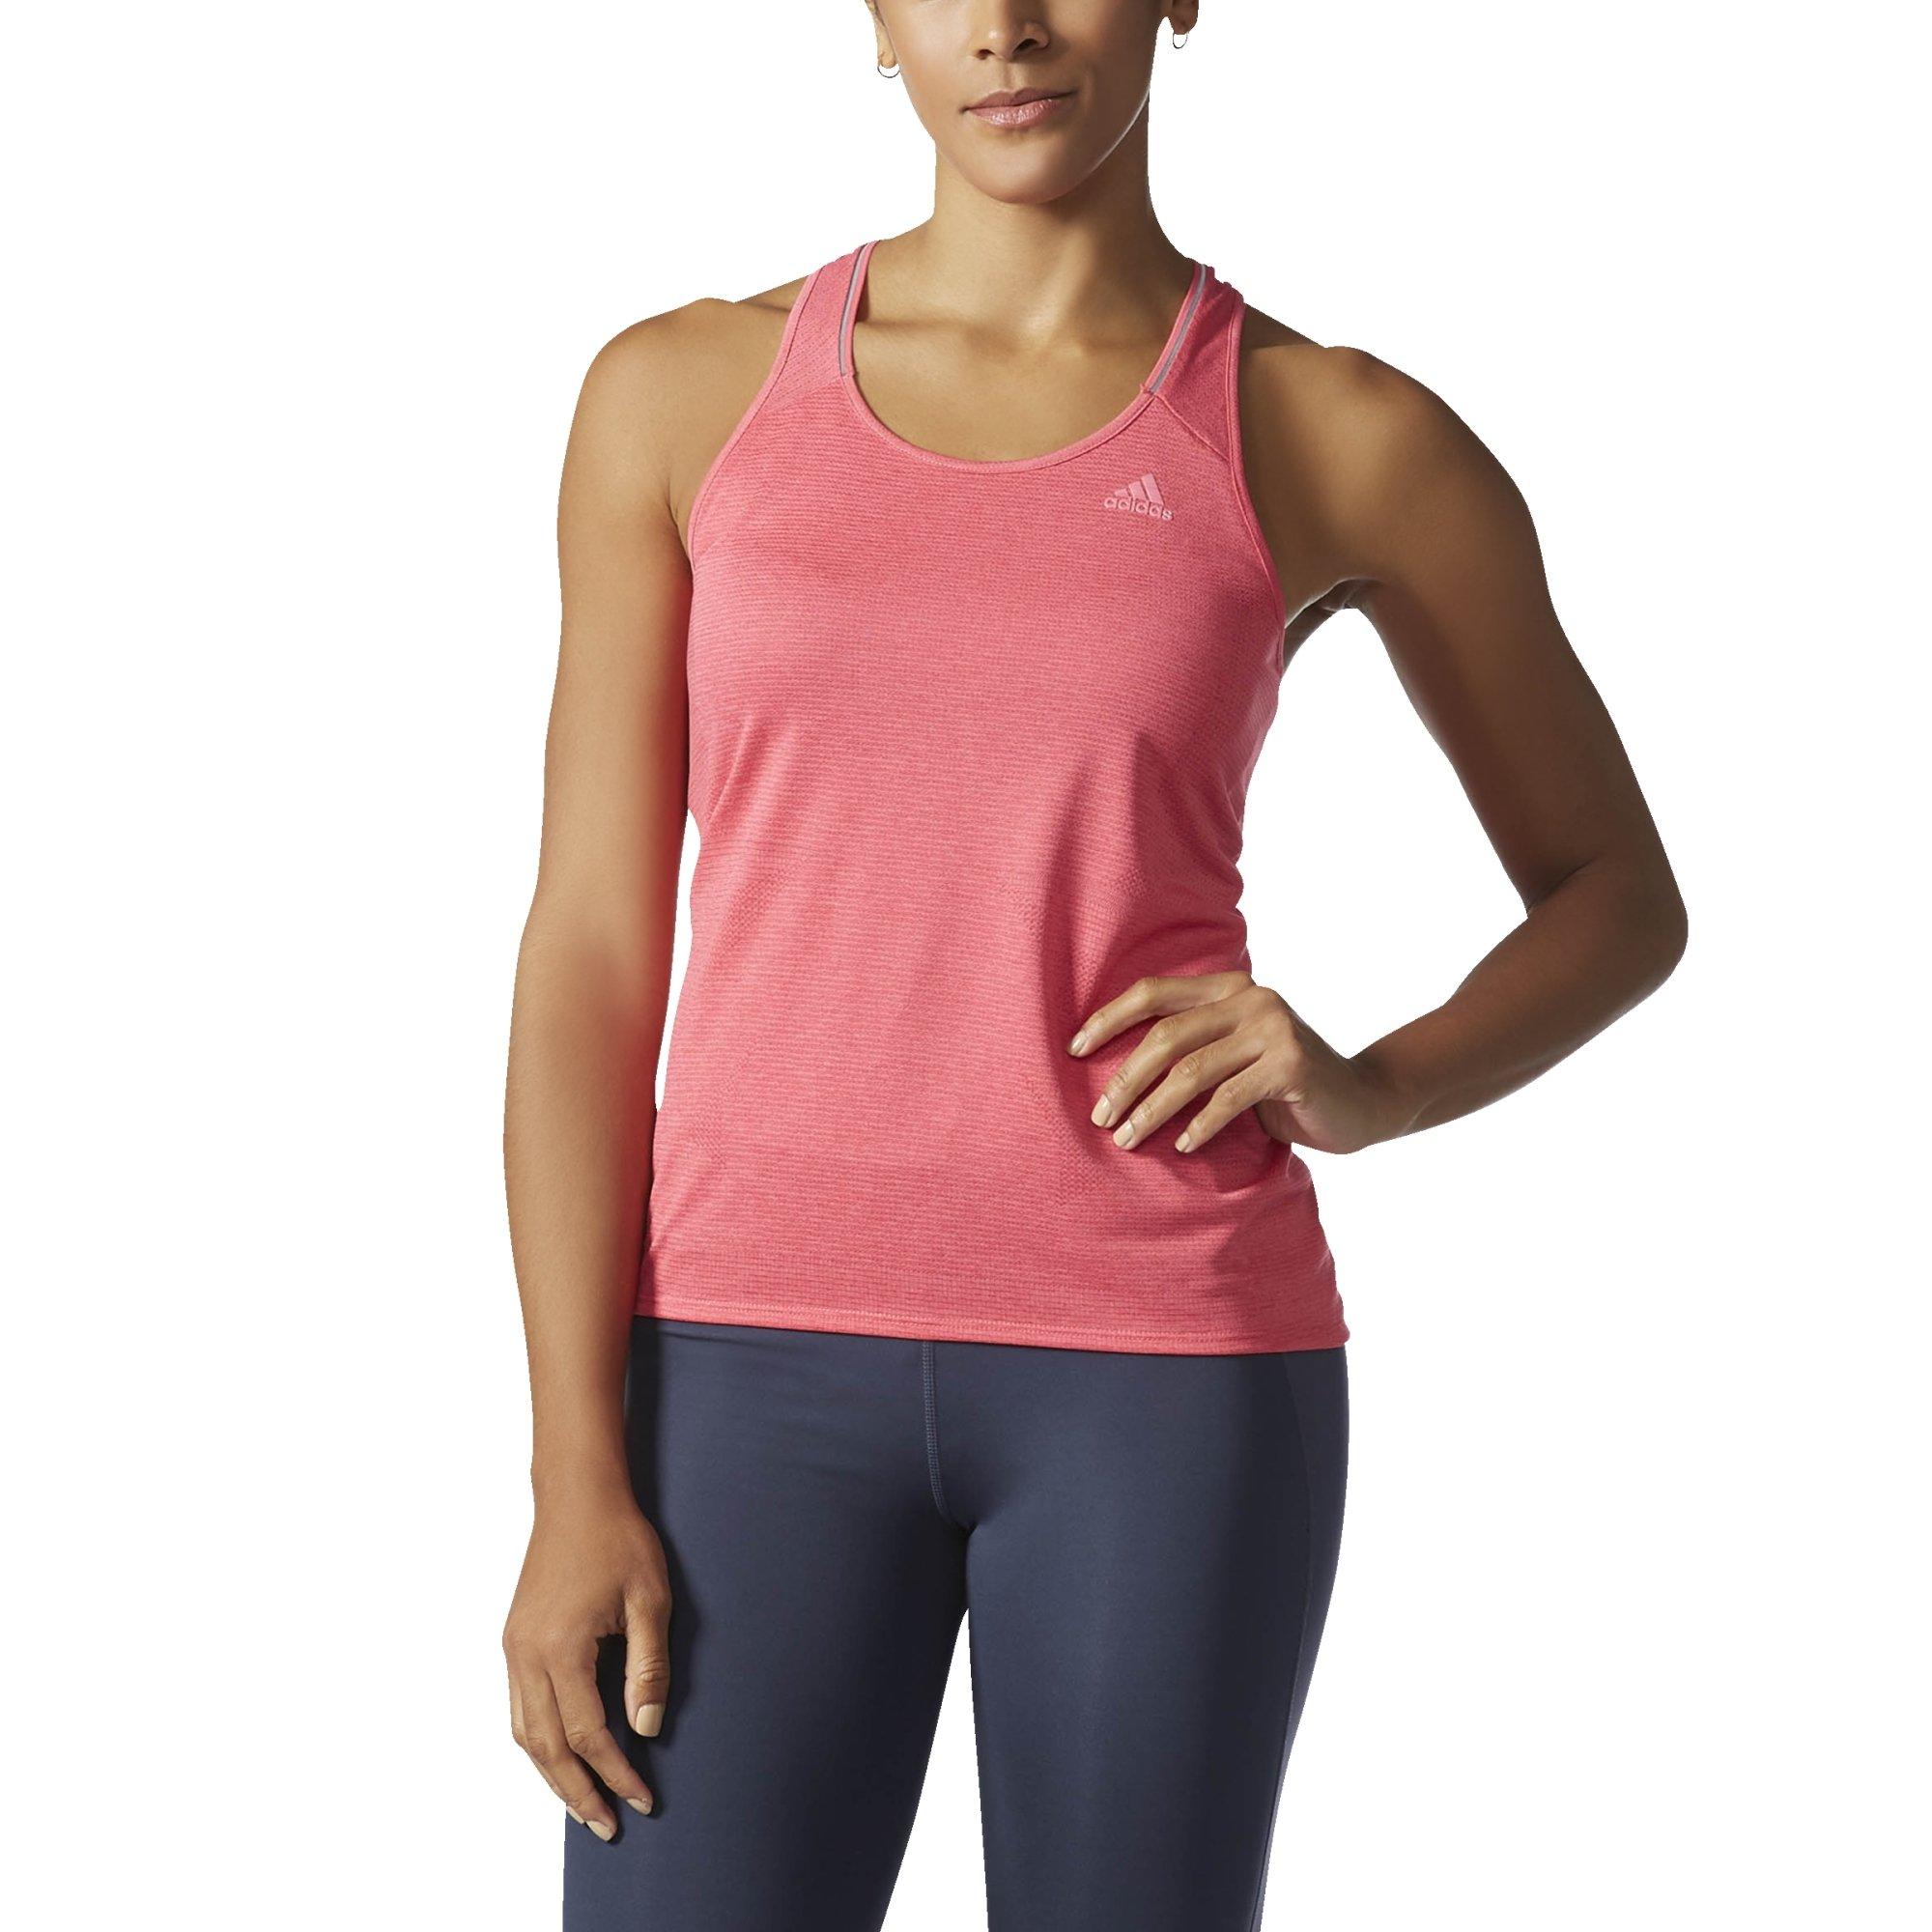 adidas Women's Running Supernova Tank Top, Super Pink, Small by adidas